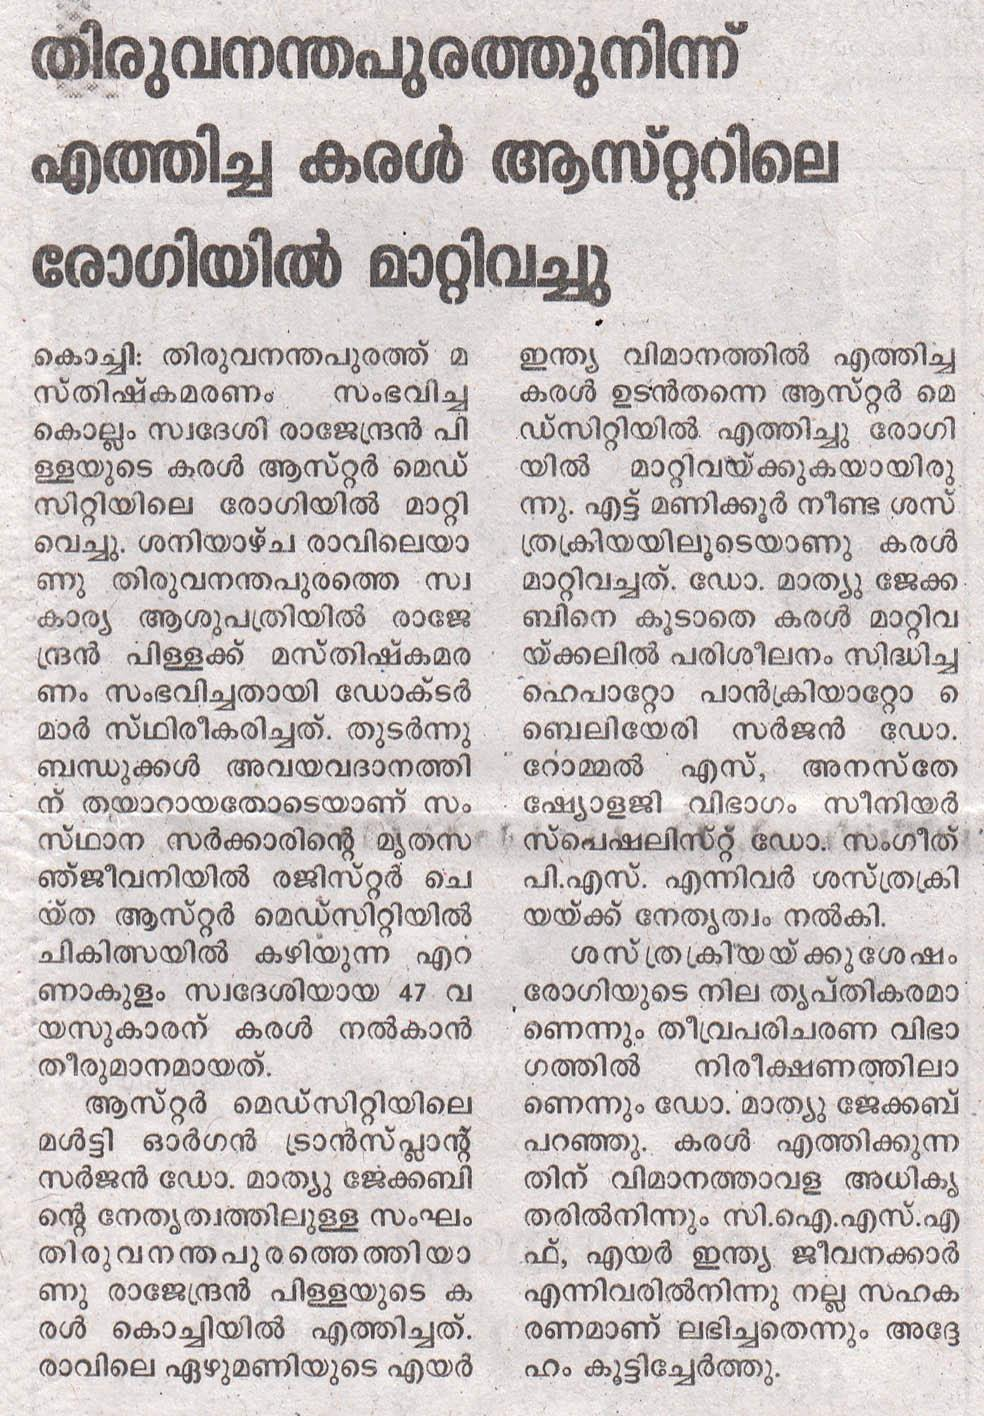 13-05-2019-Mangalam-Pg-08